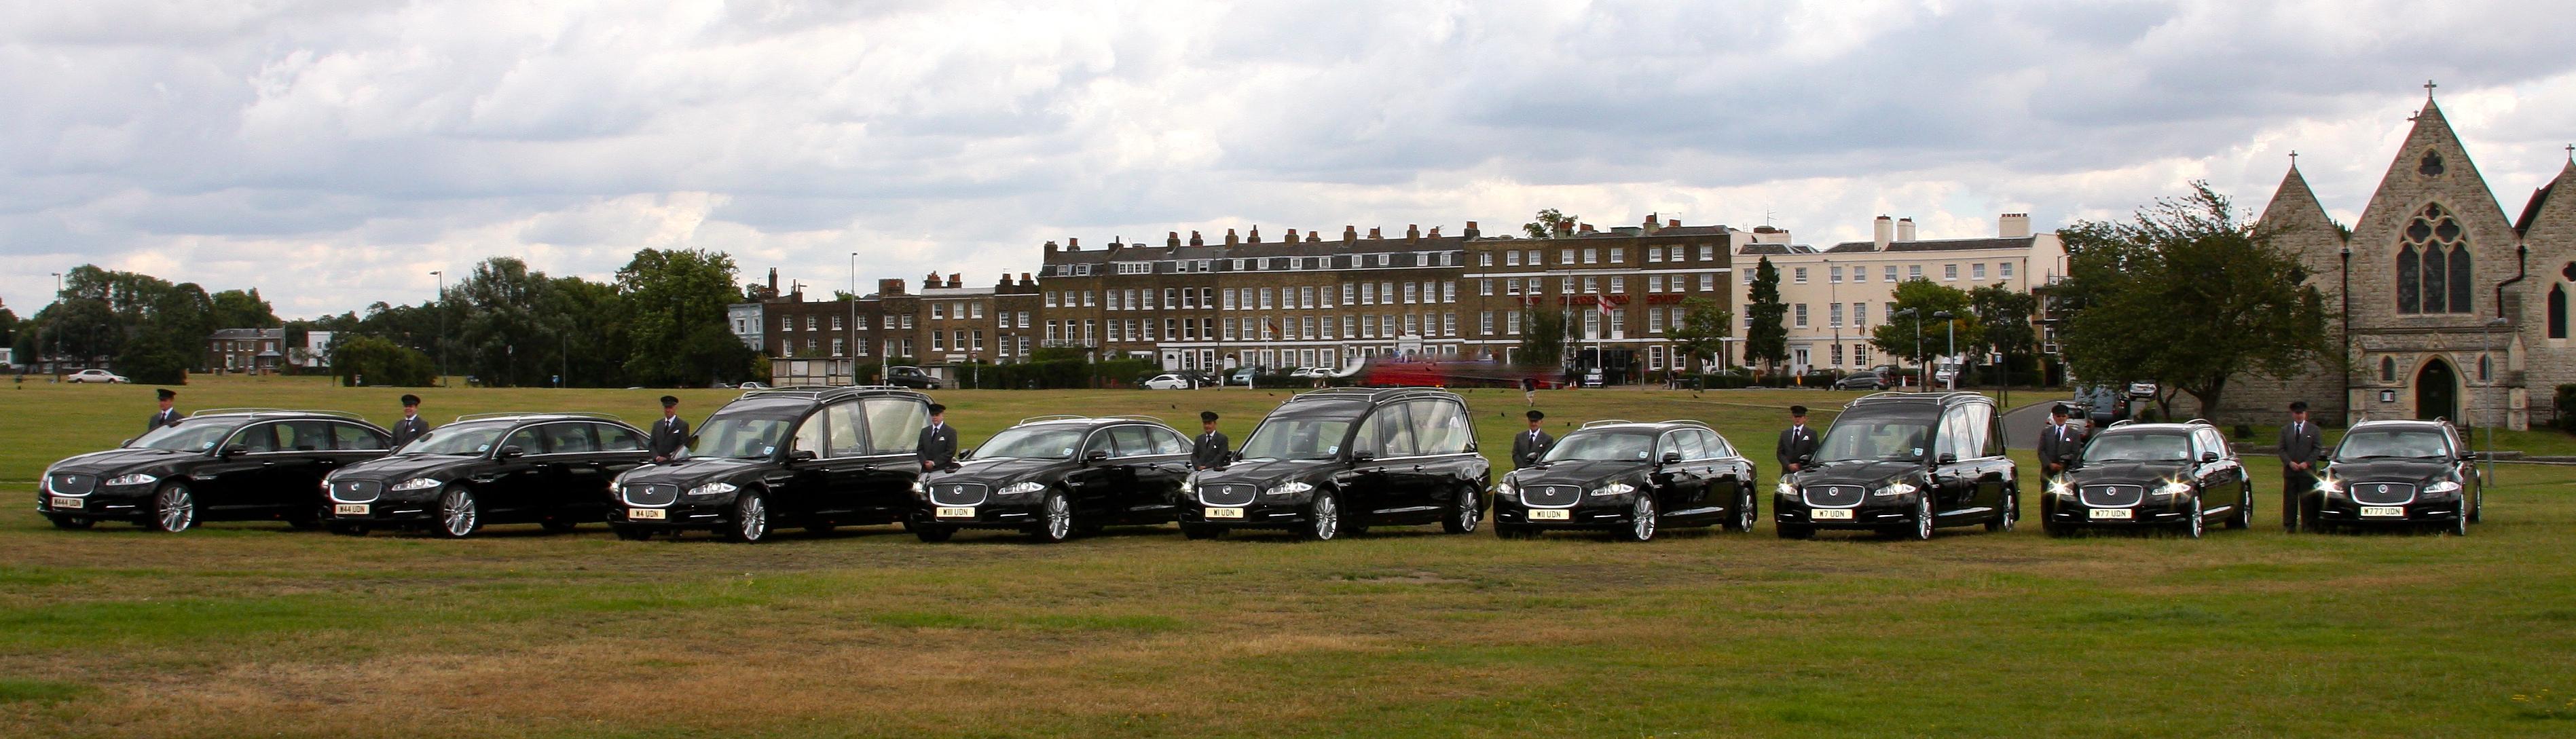 Funeral car Insurance image